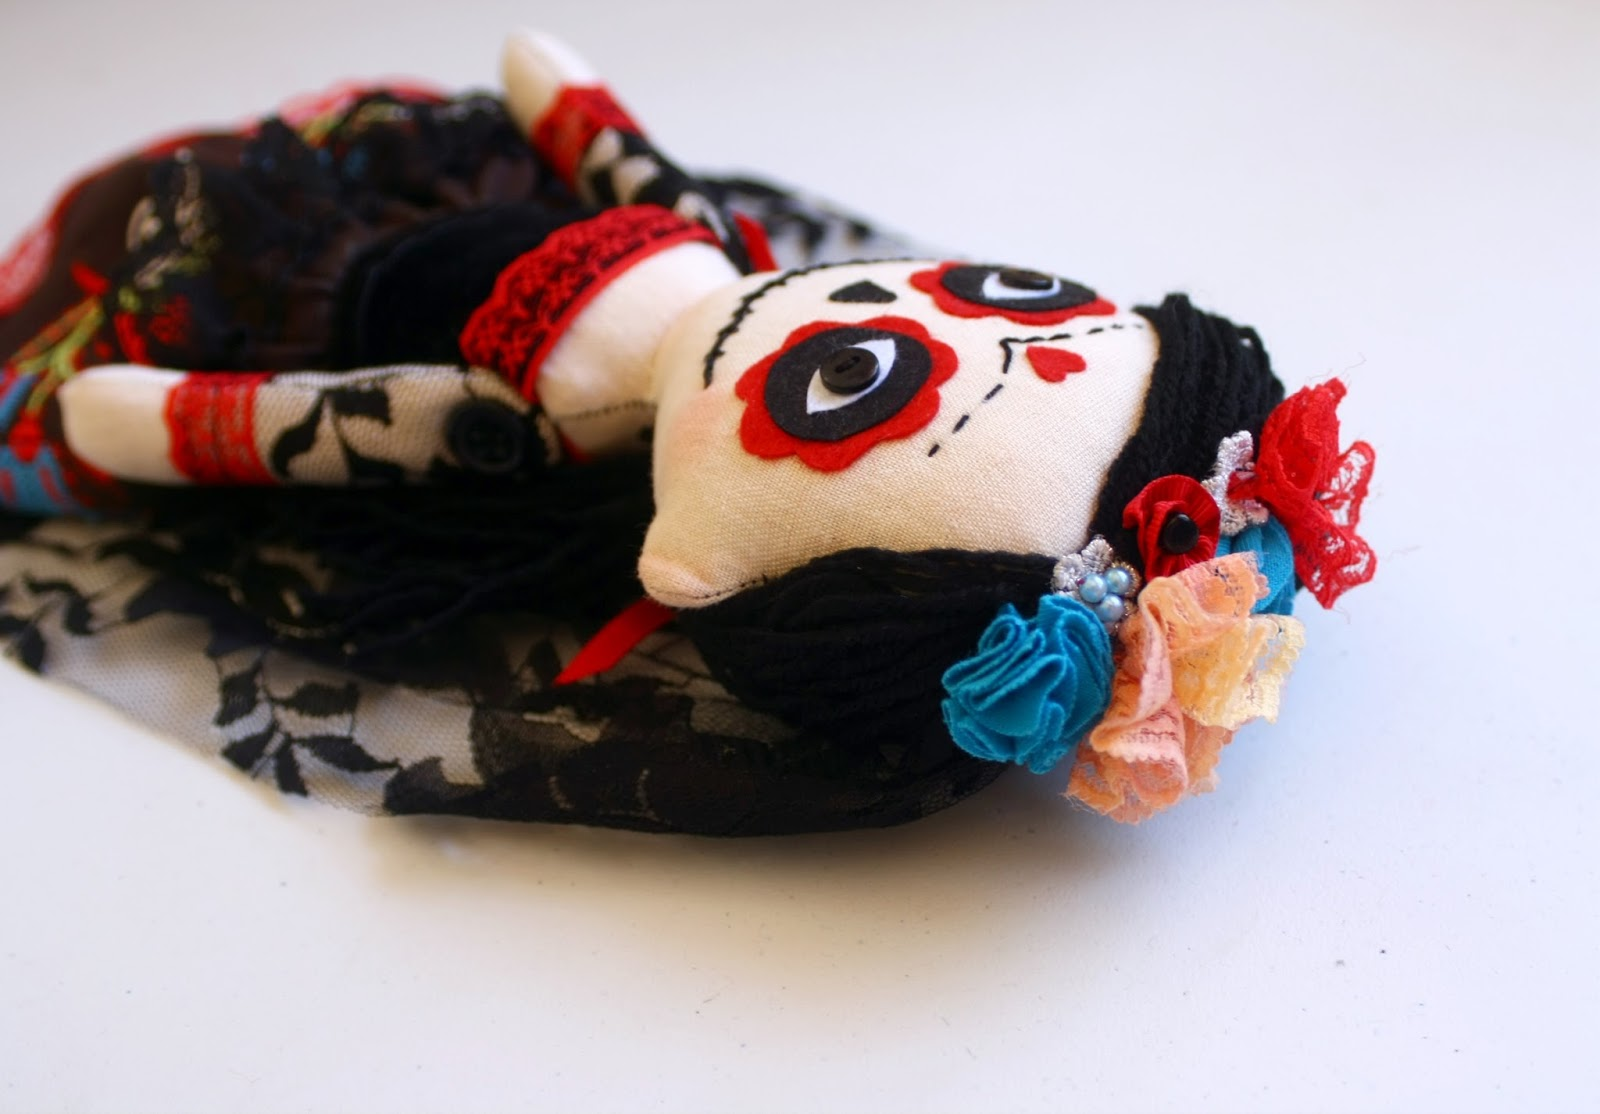 Muñeca de La Catrina hecha a mano, detalle